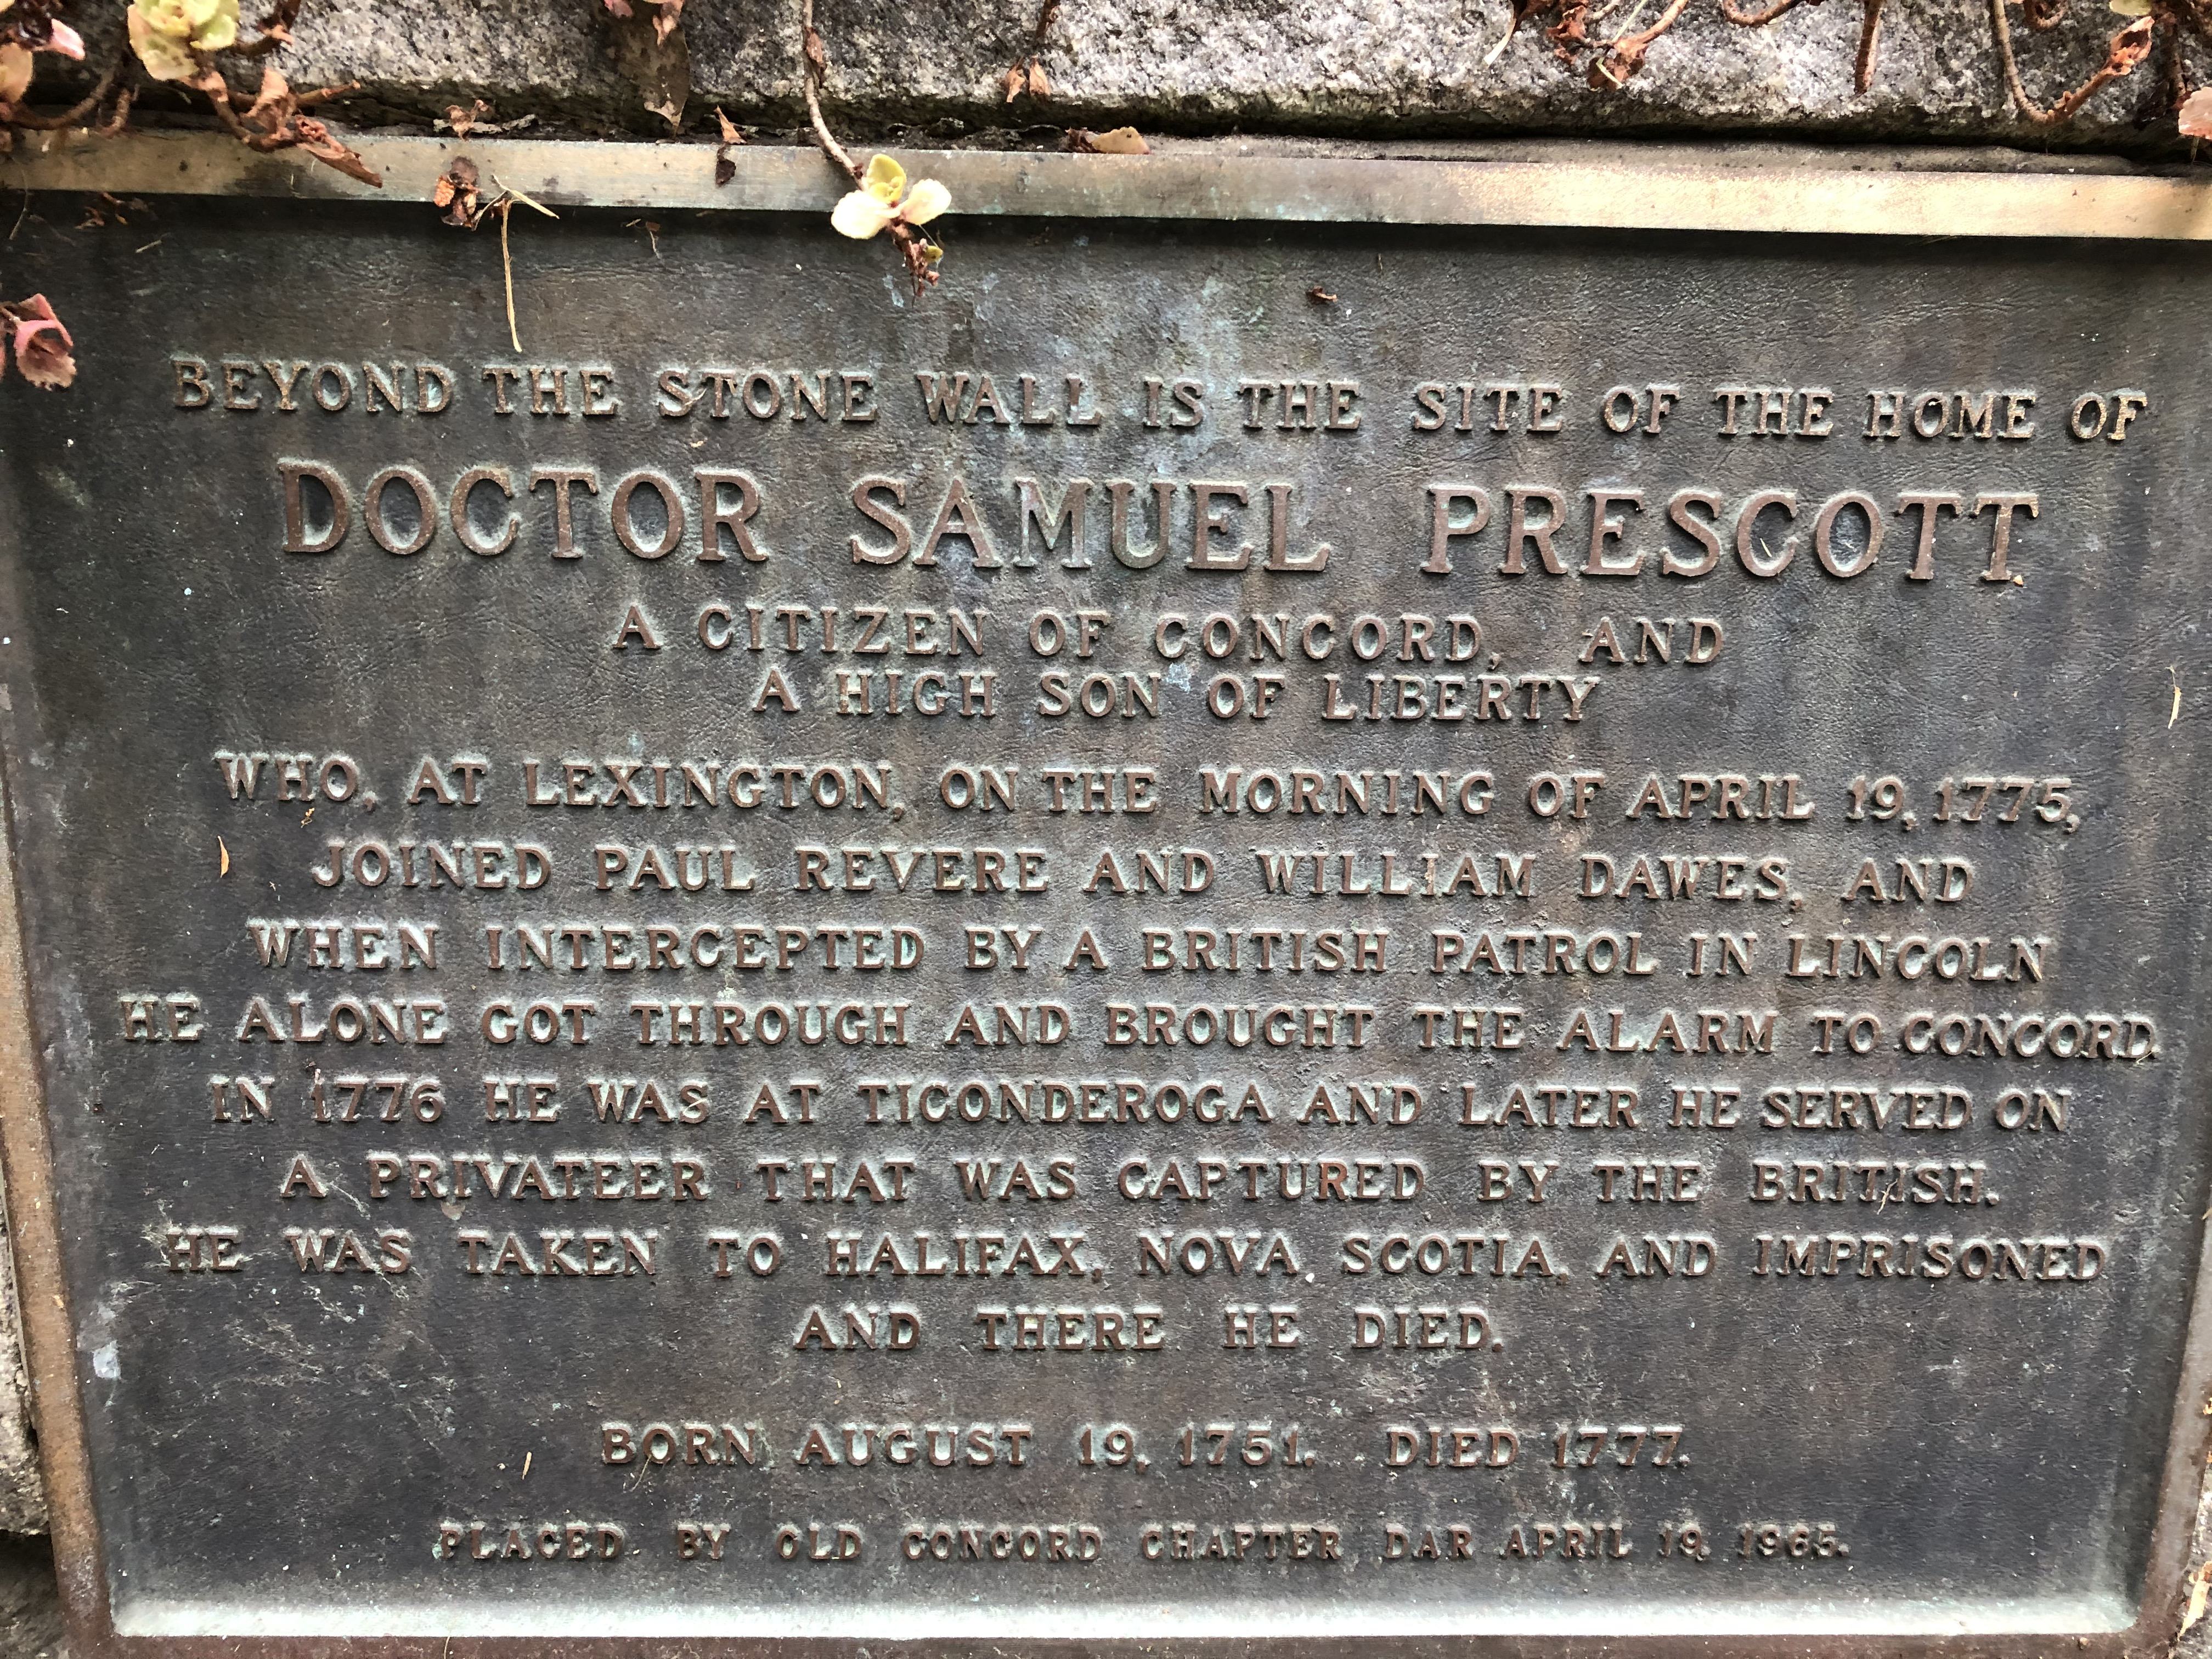 070320-Samuel-Prescott-sign